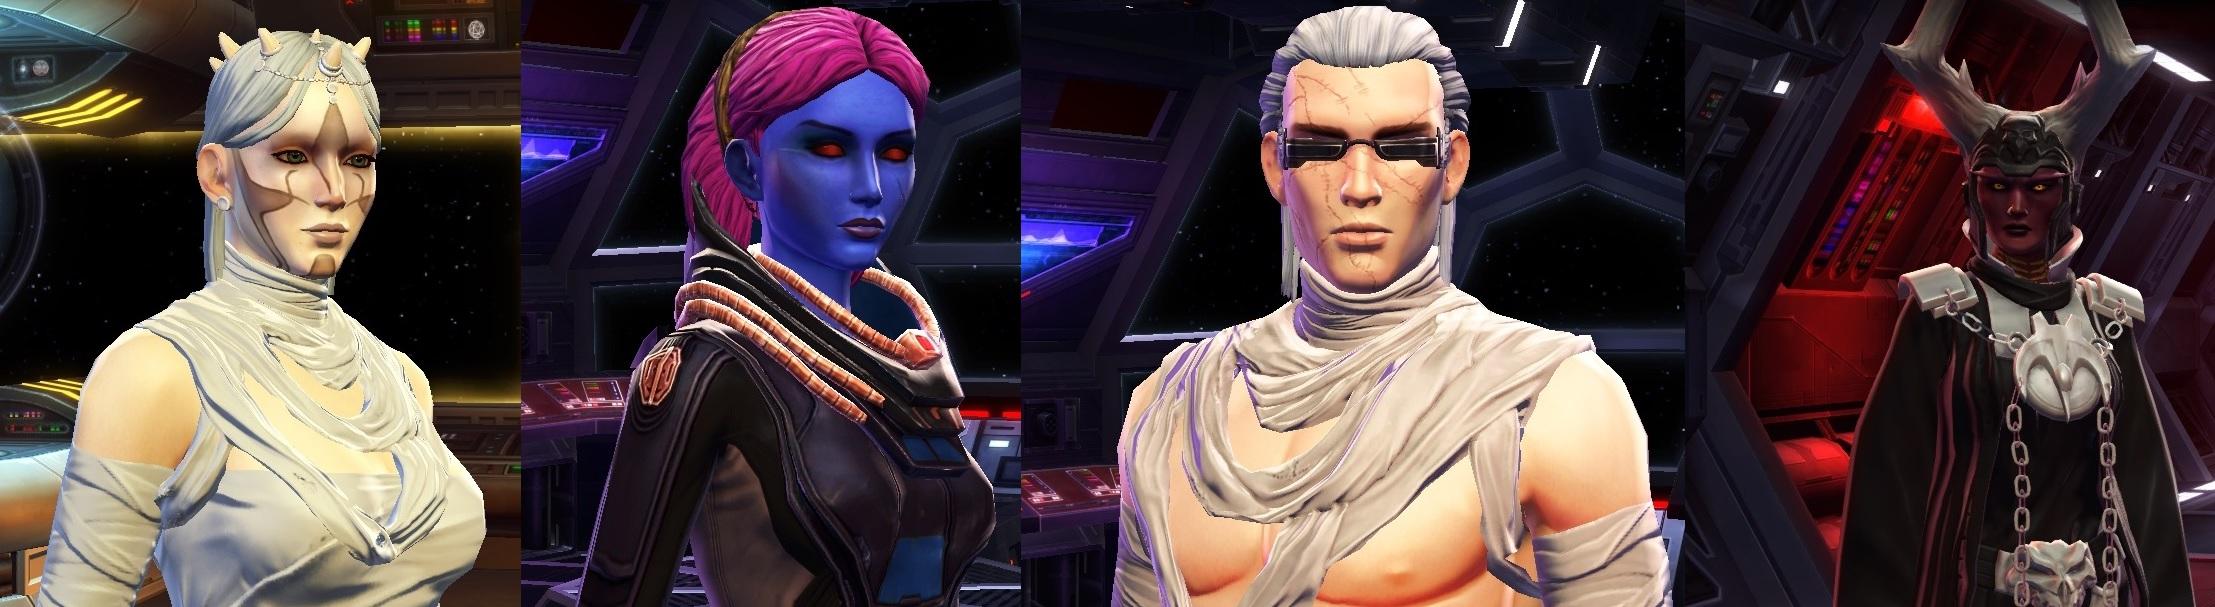 SWTOR Main Characters